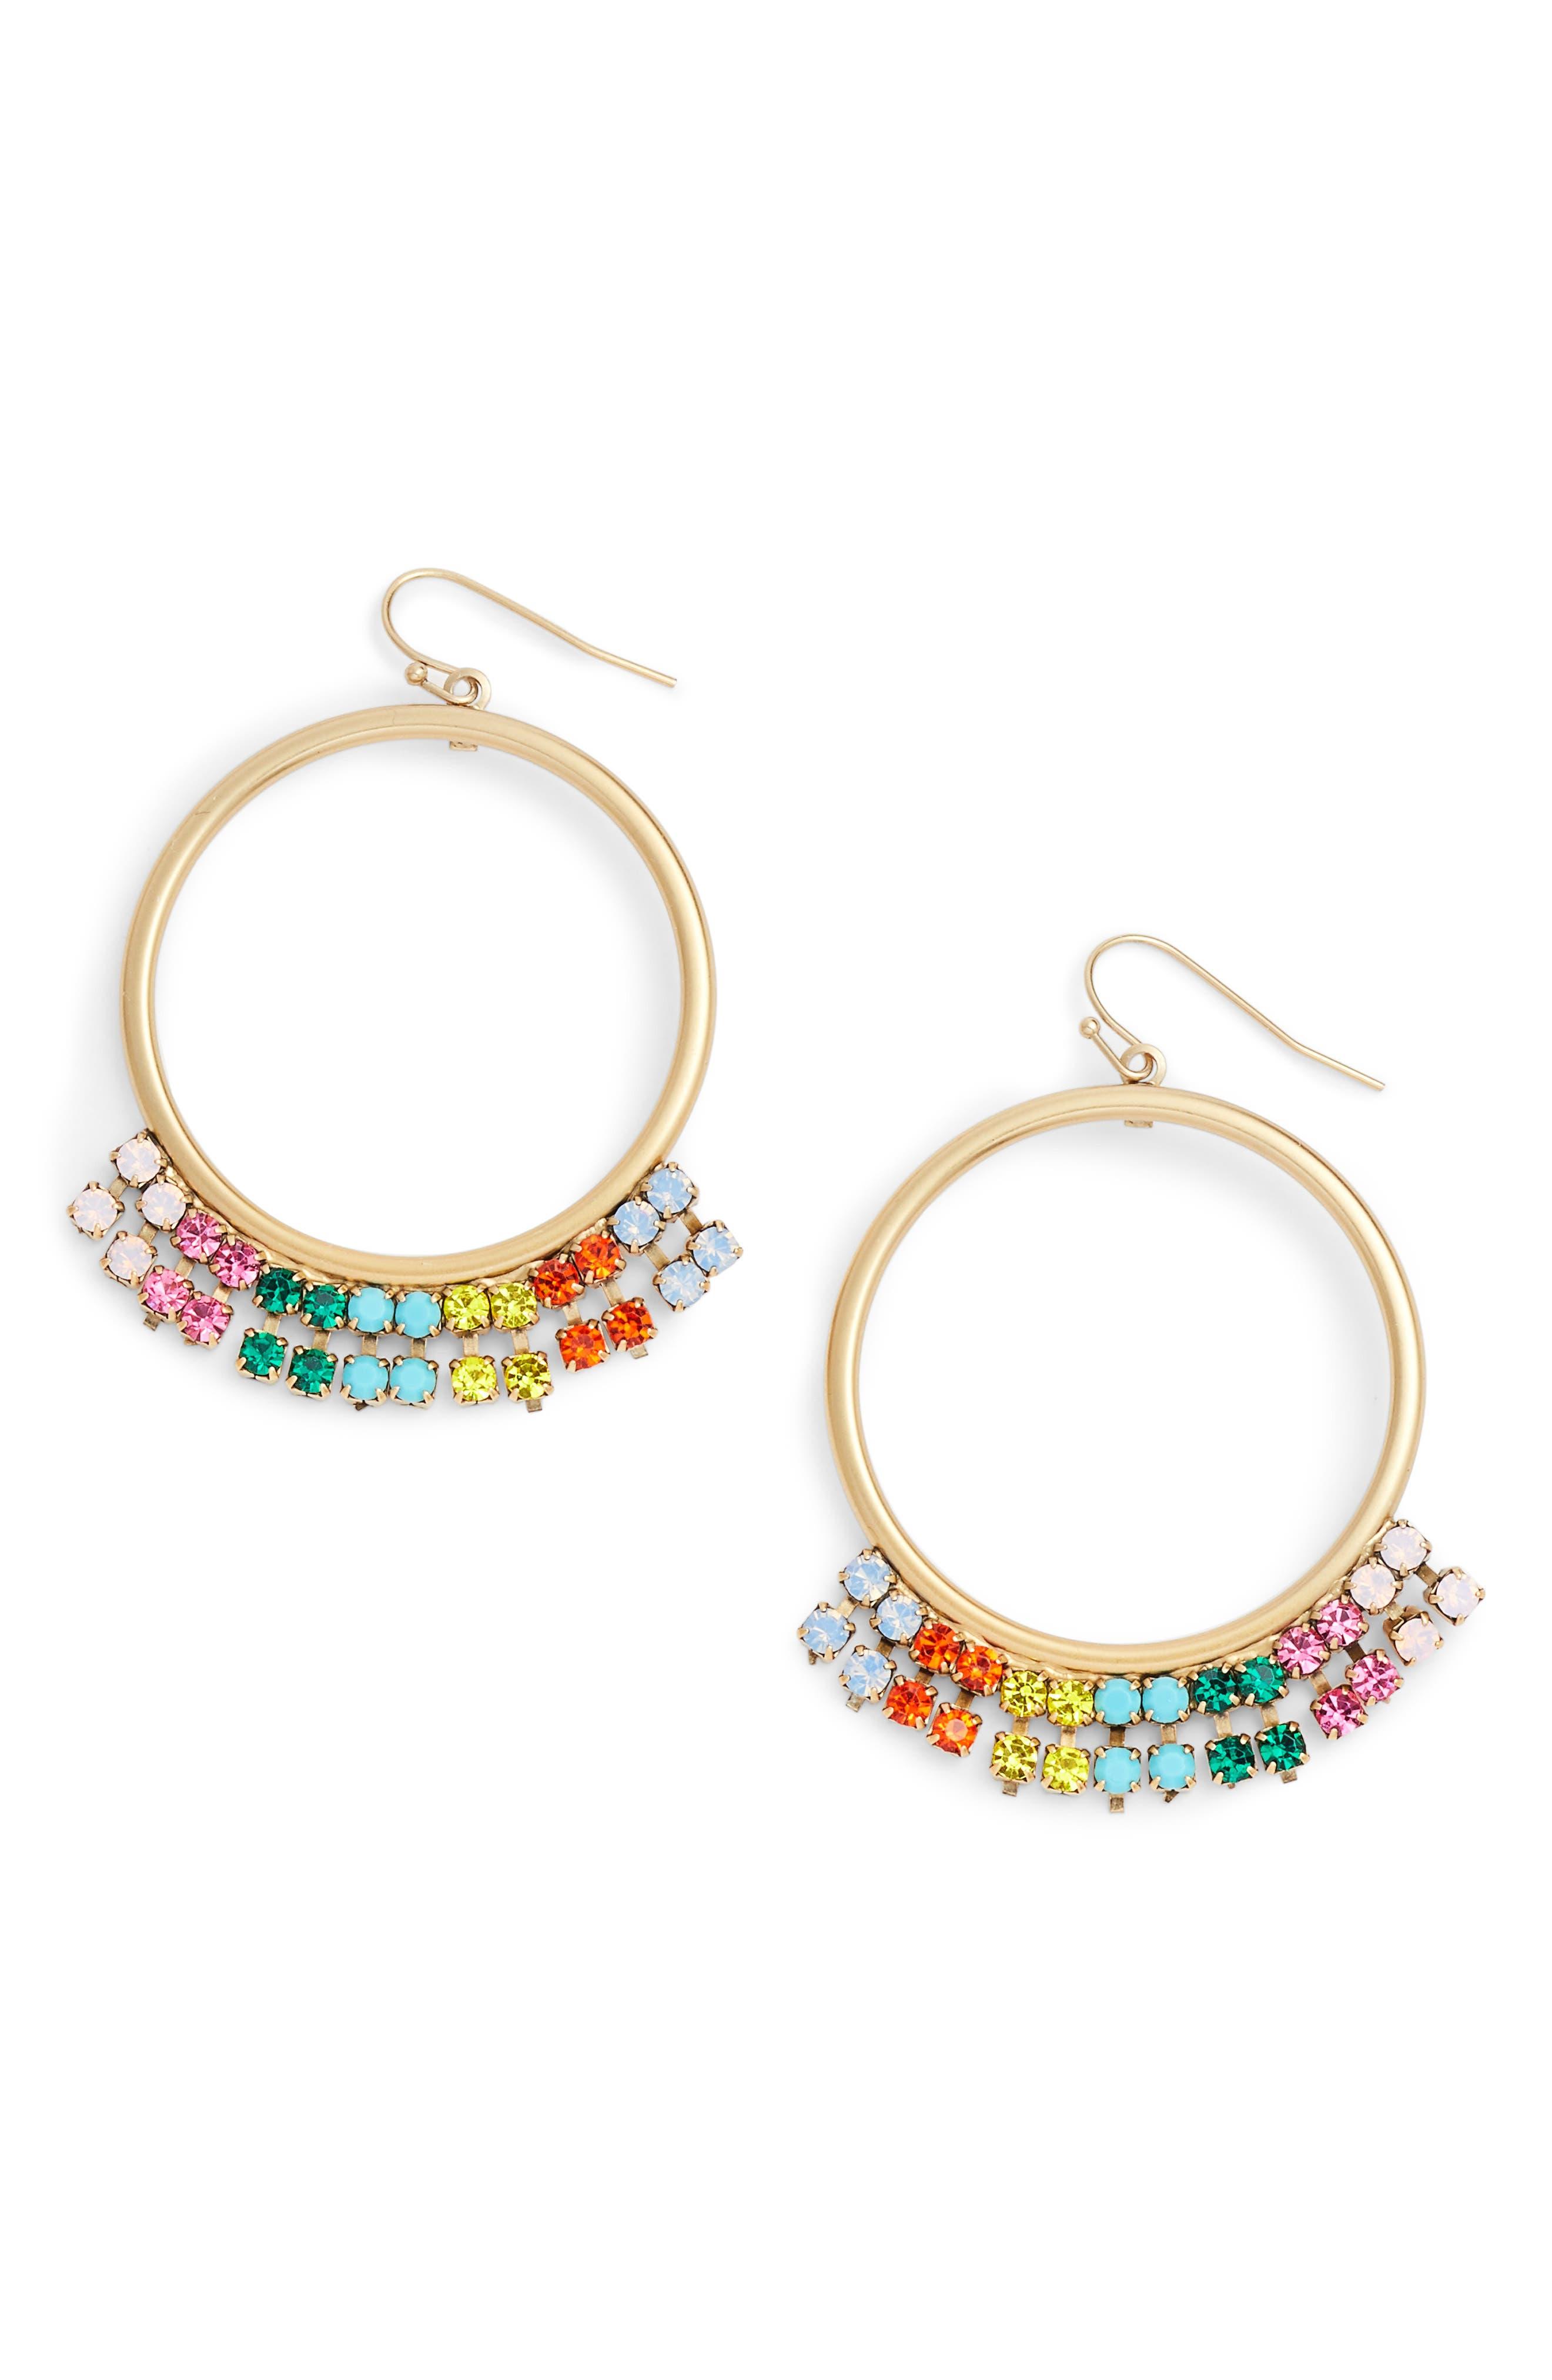 Emma Circle Drop Earrings,                             Main thumbnail 1, color,                             710